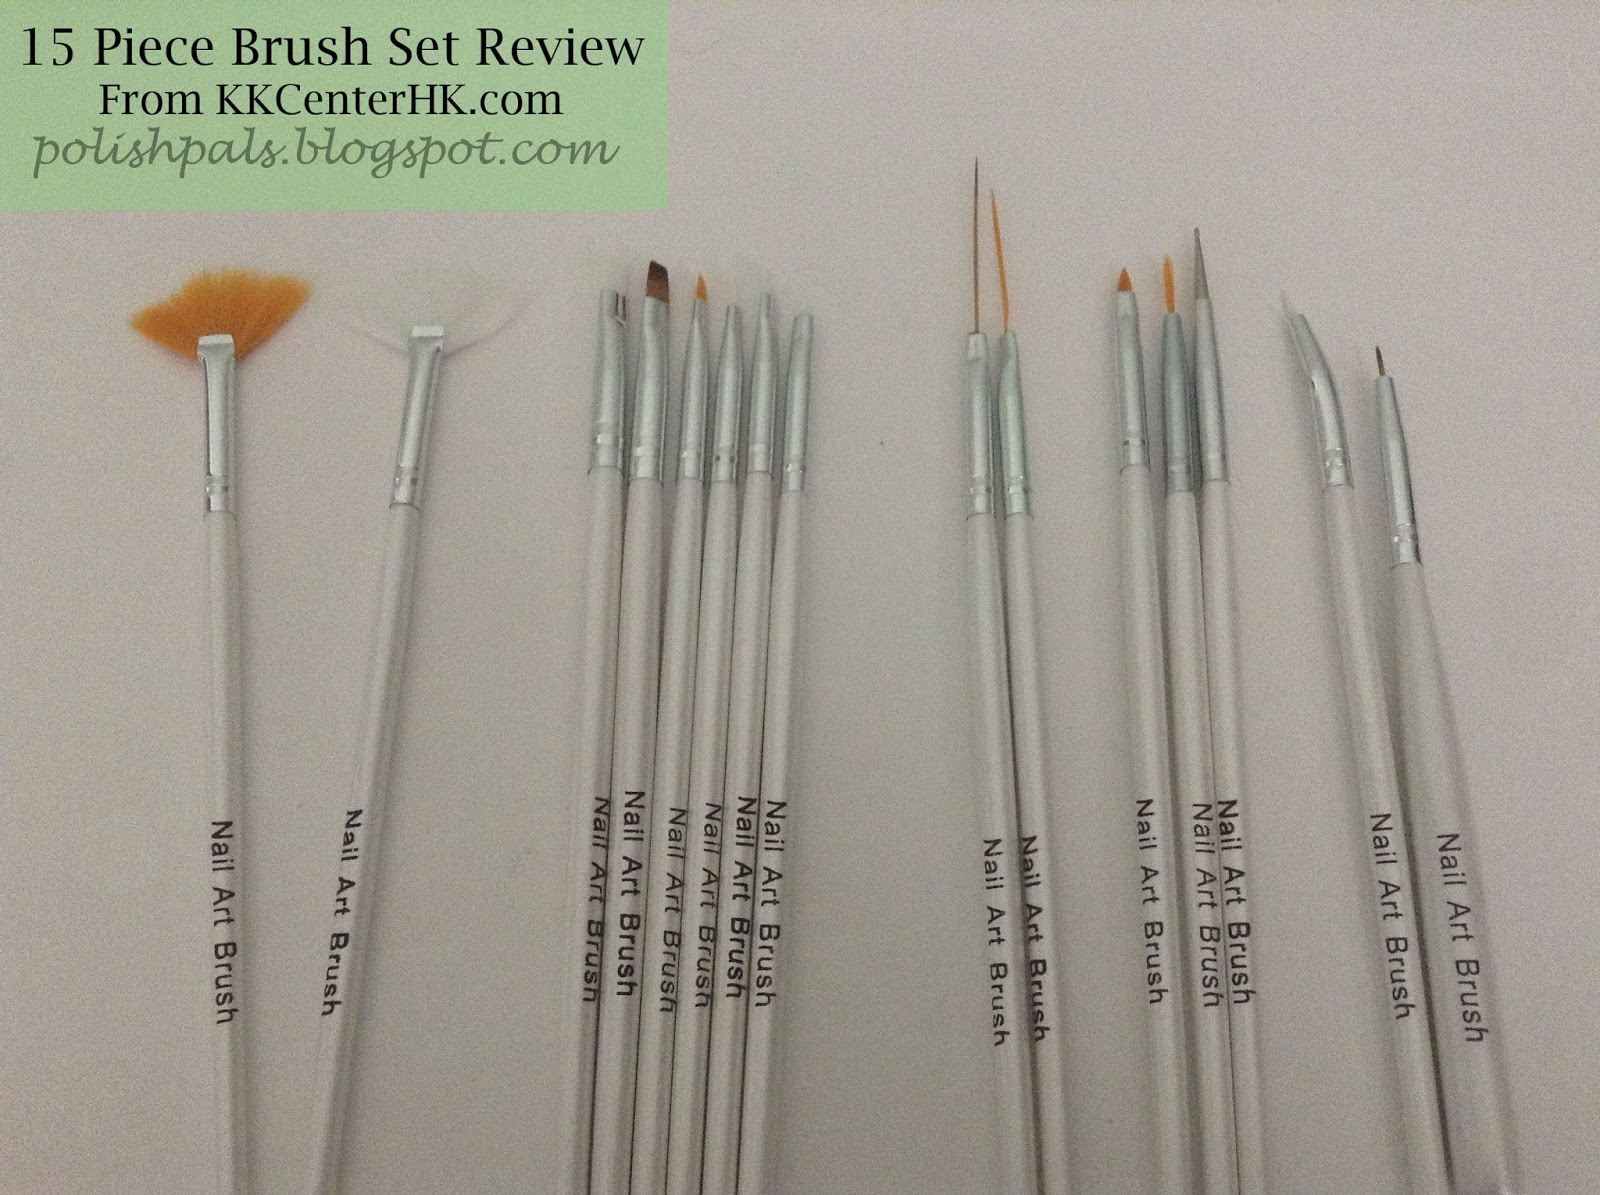 Polish Pals: 15 Brush Set Review {From KKCenterHK.com}